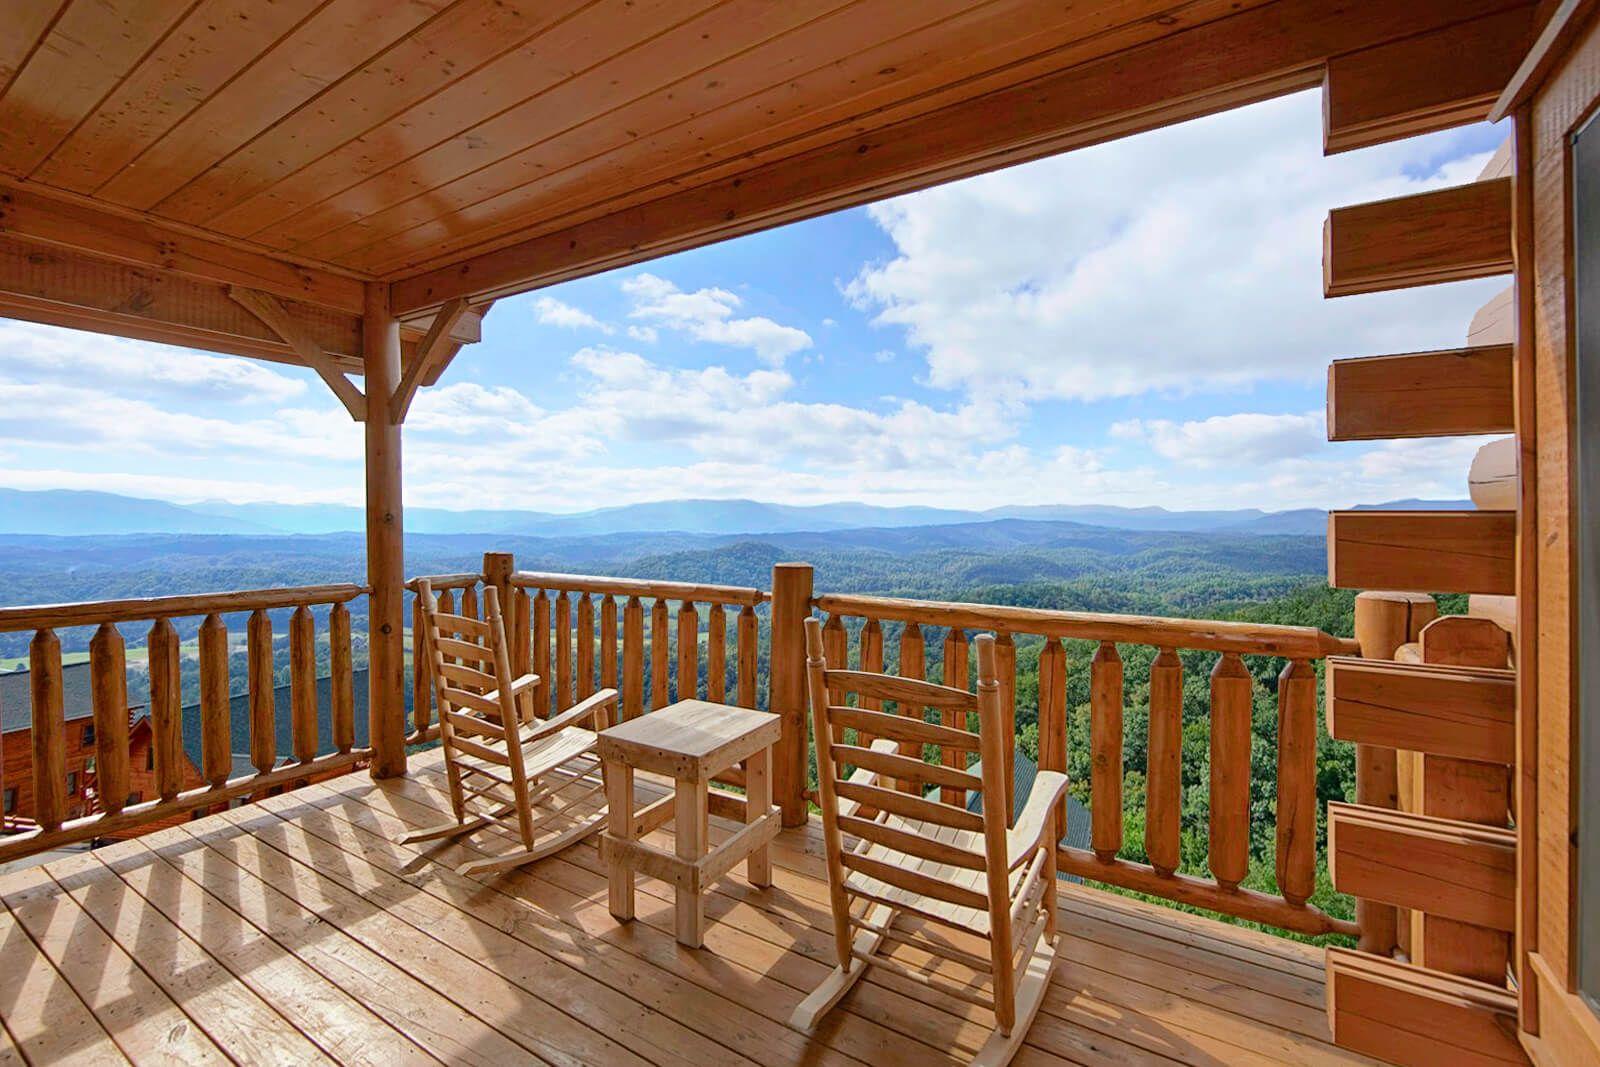 68 Honeymoon Cabins Ideas Honeymoon Cabin Cabin Rentals Gatlinburg Cabins